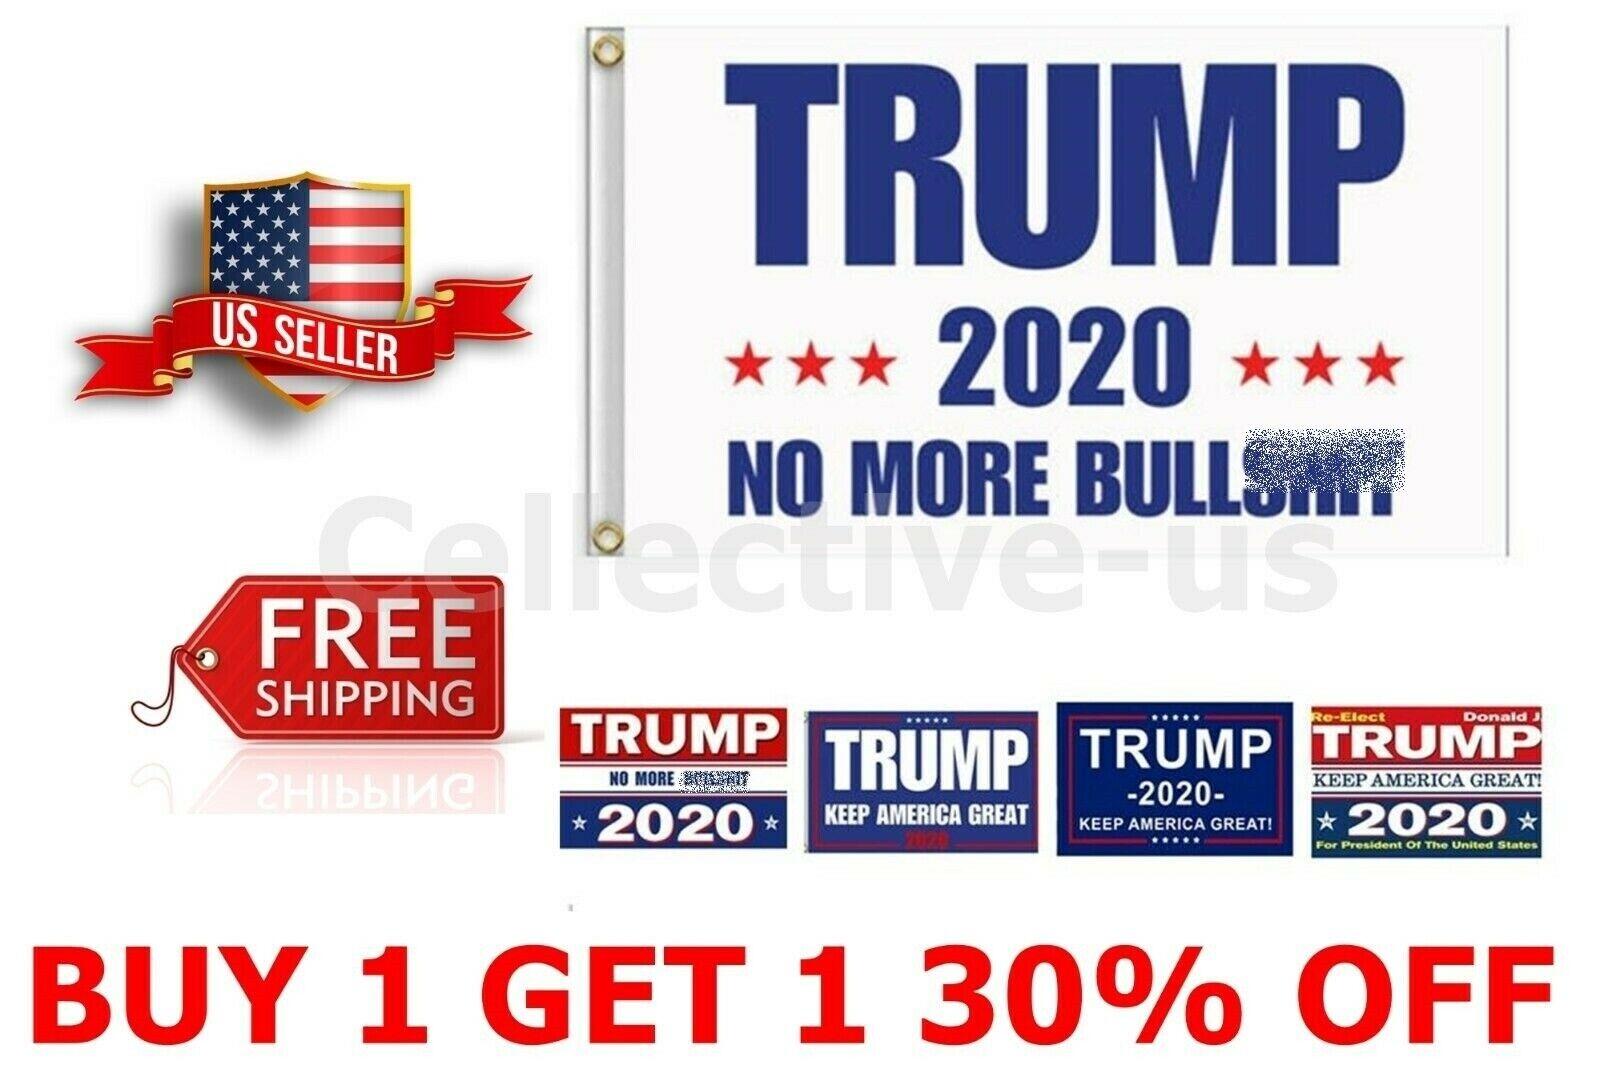 Trump 2020 Flag Keep America Great President MAGA 3x5 Feet Flag FREE Shipping^